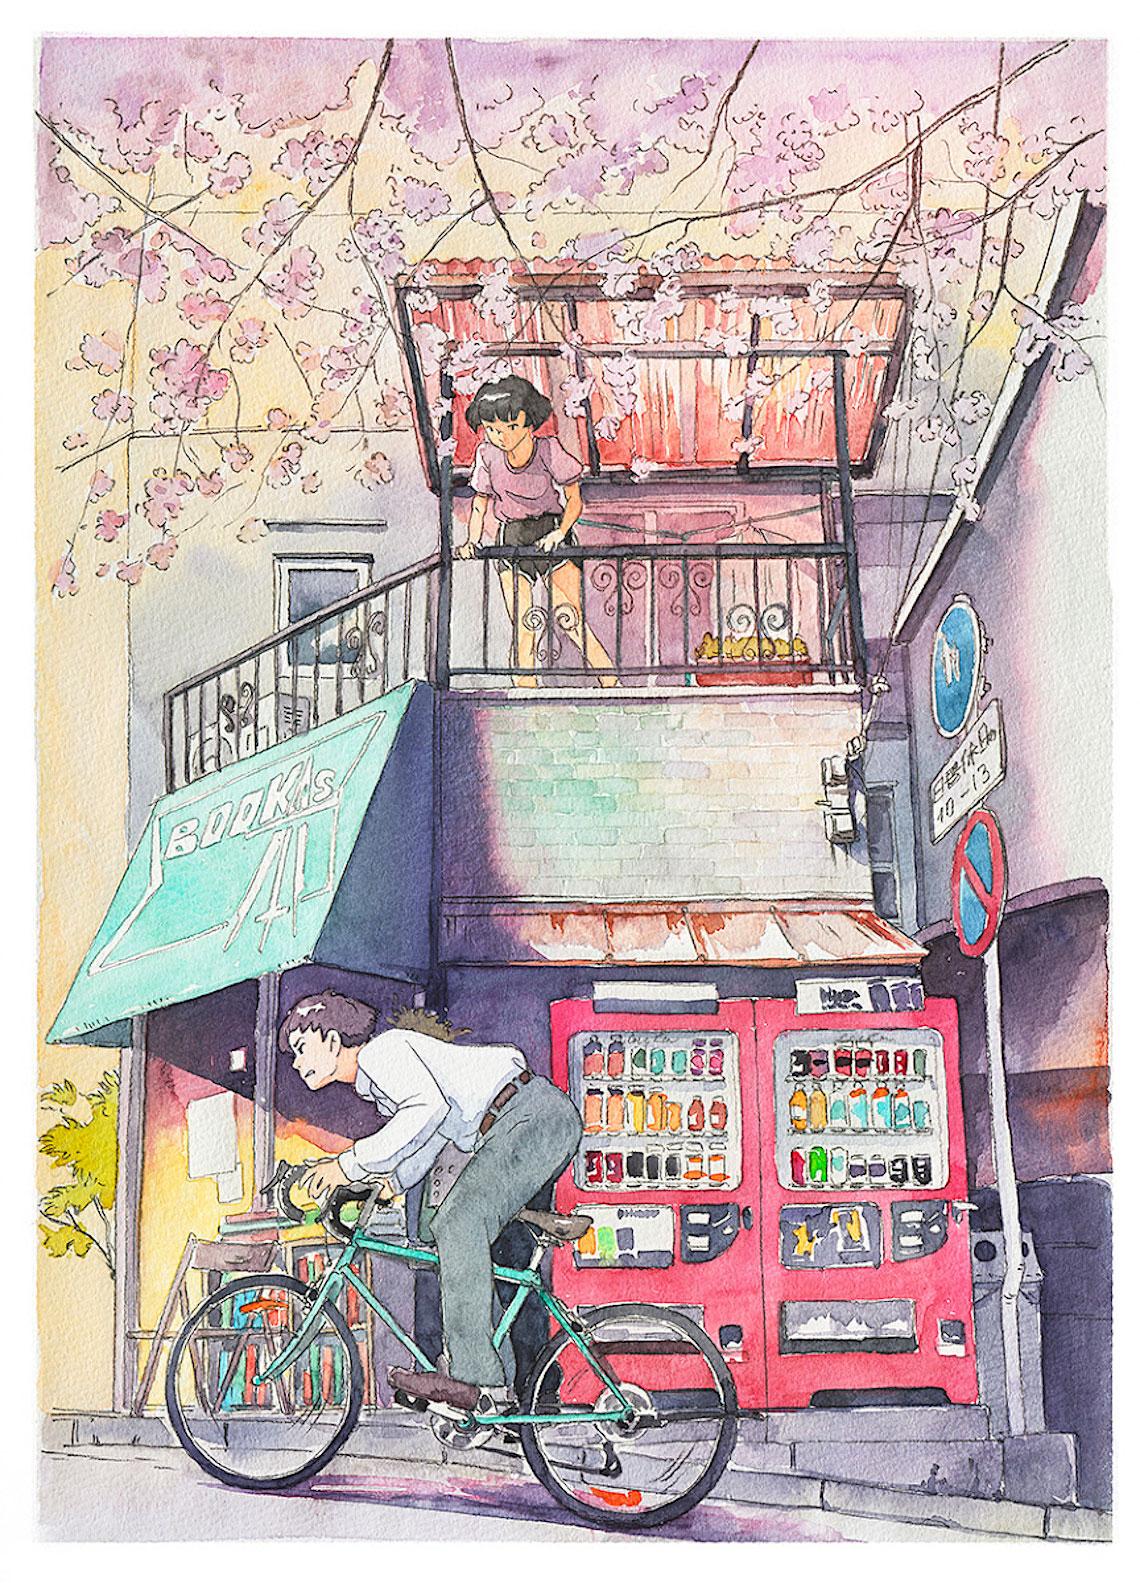 Mateusz Urbanowicz BicycleBoy illustration series_urbancycling_3